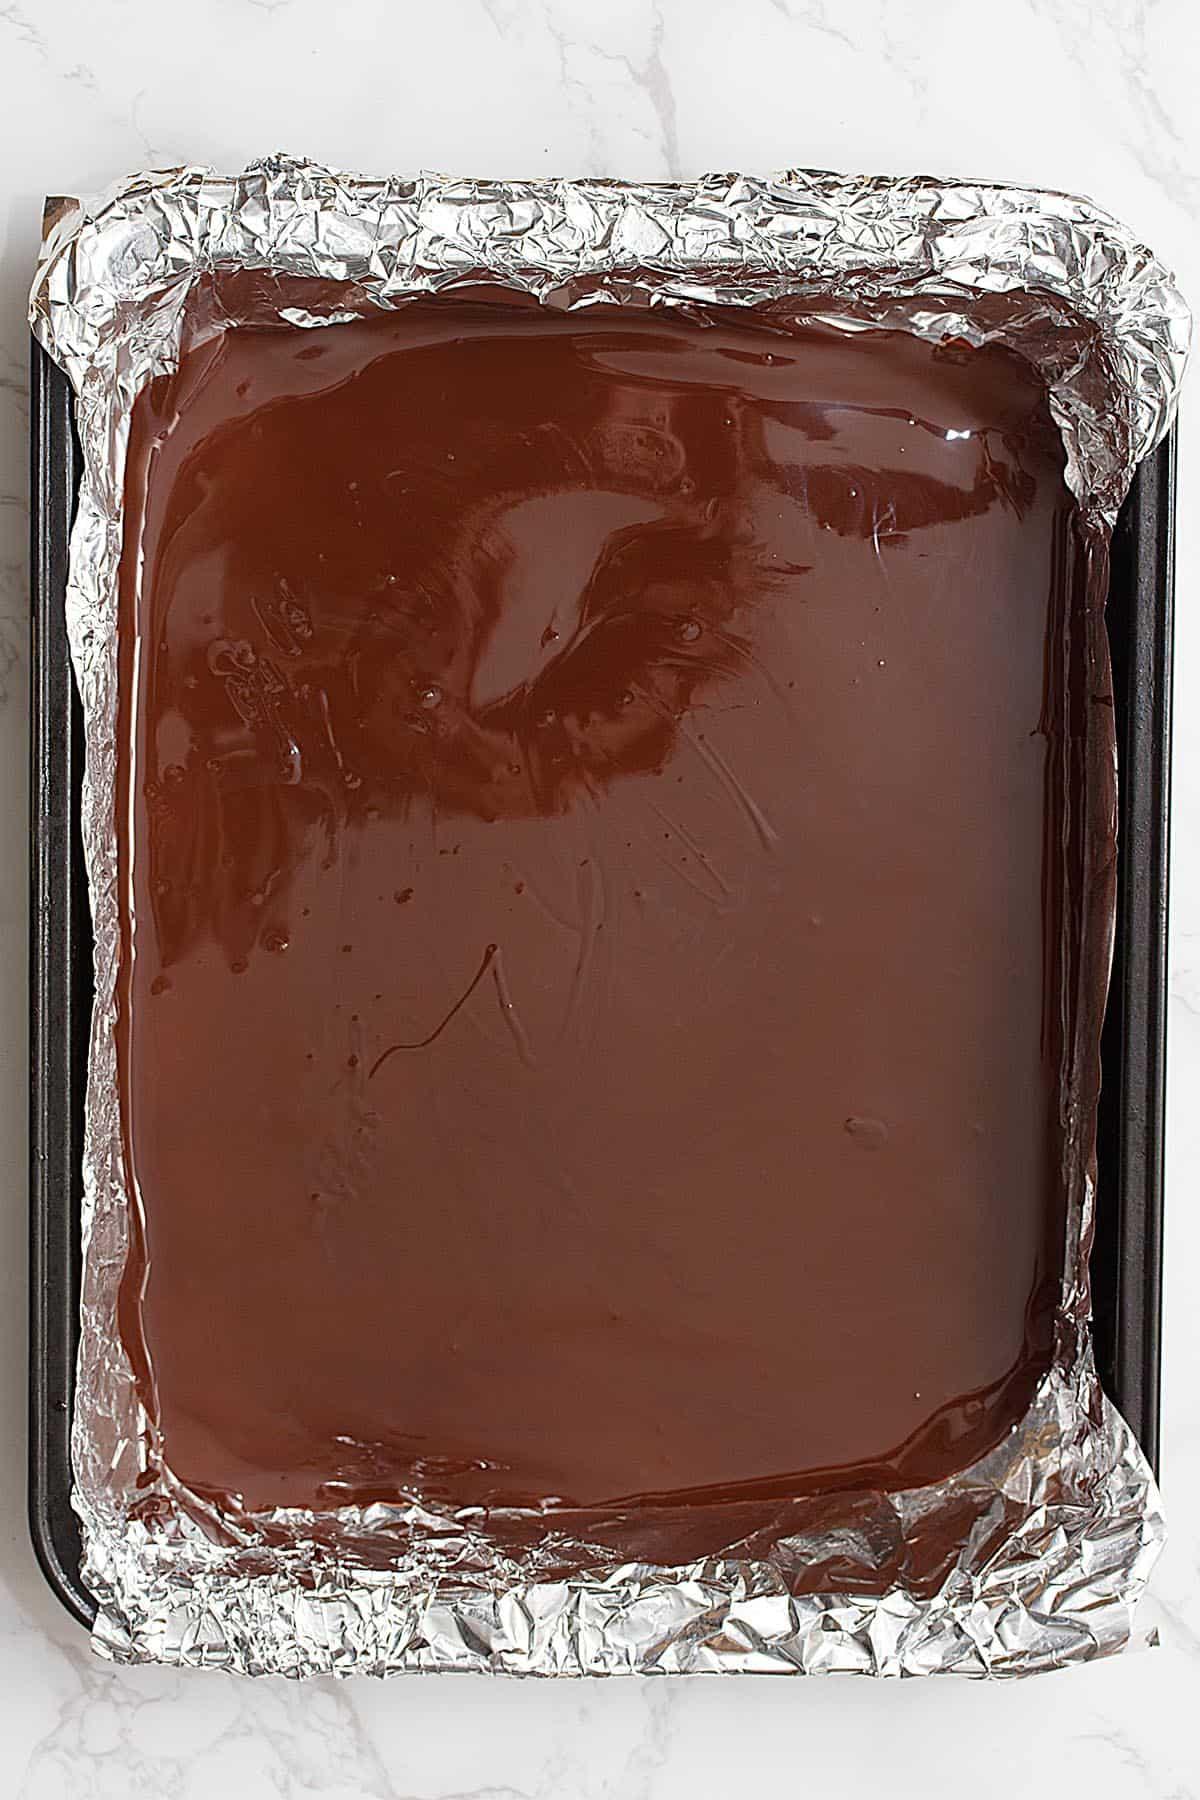 vegan dark chocolate peppermint bark